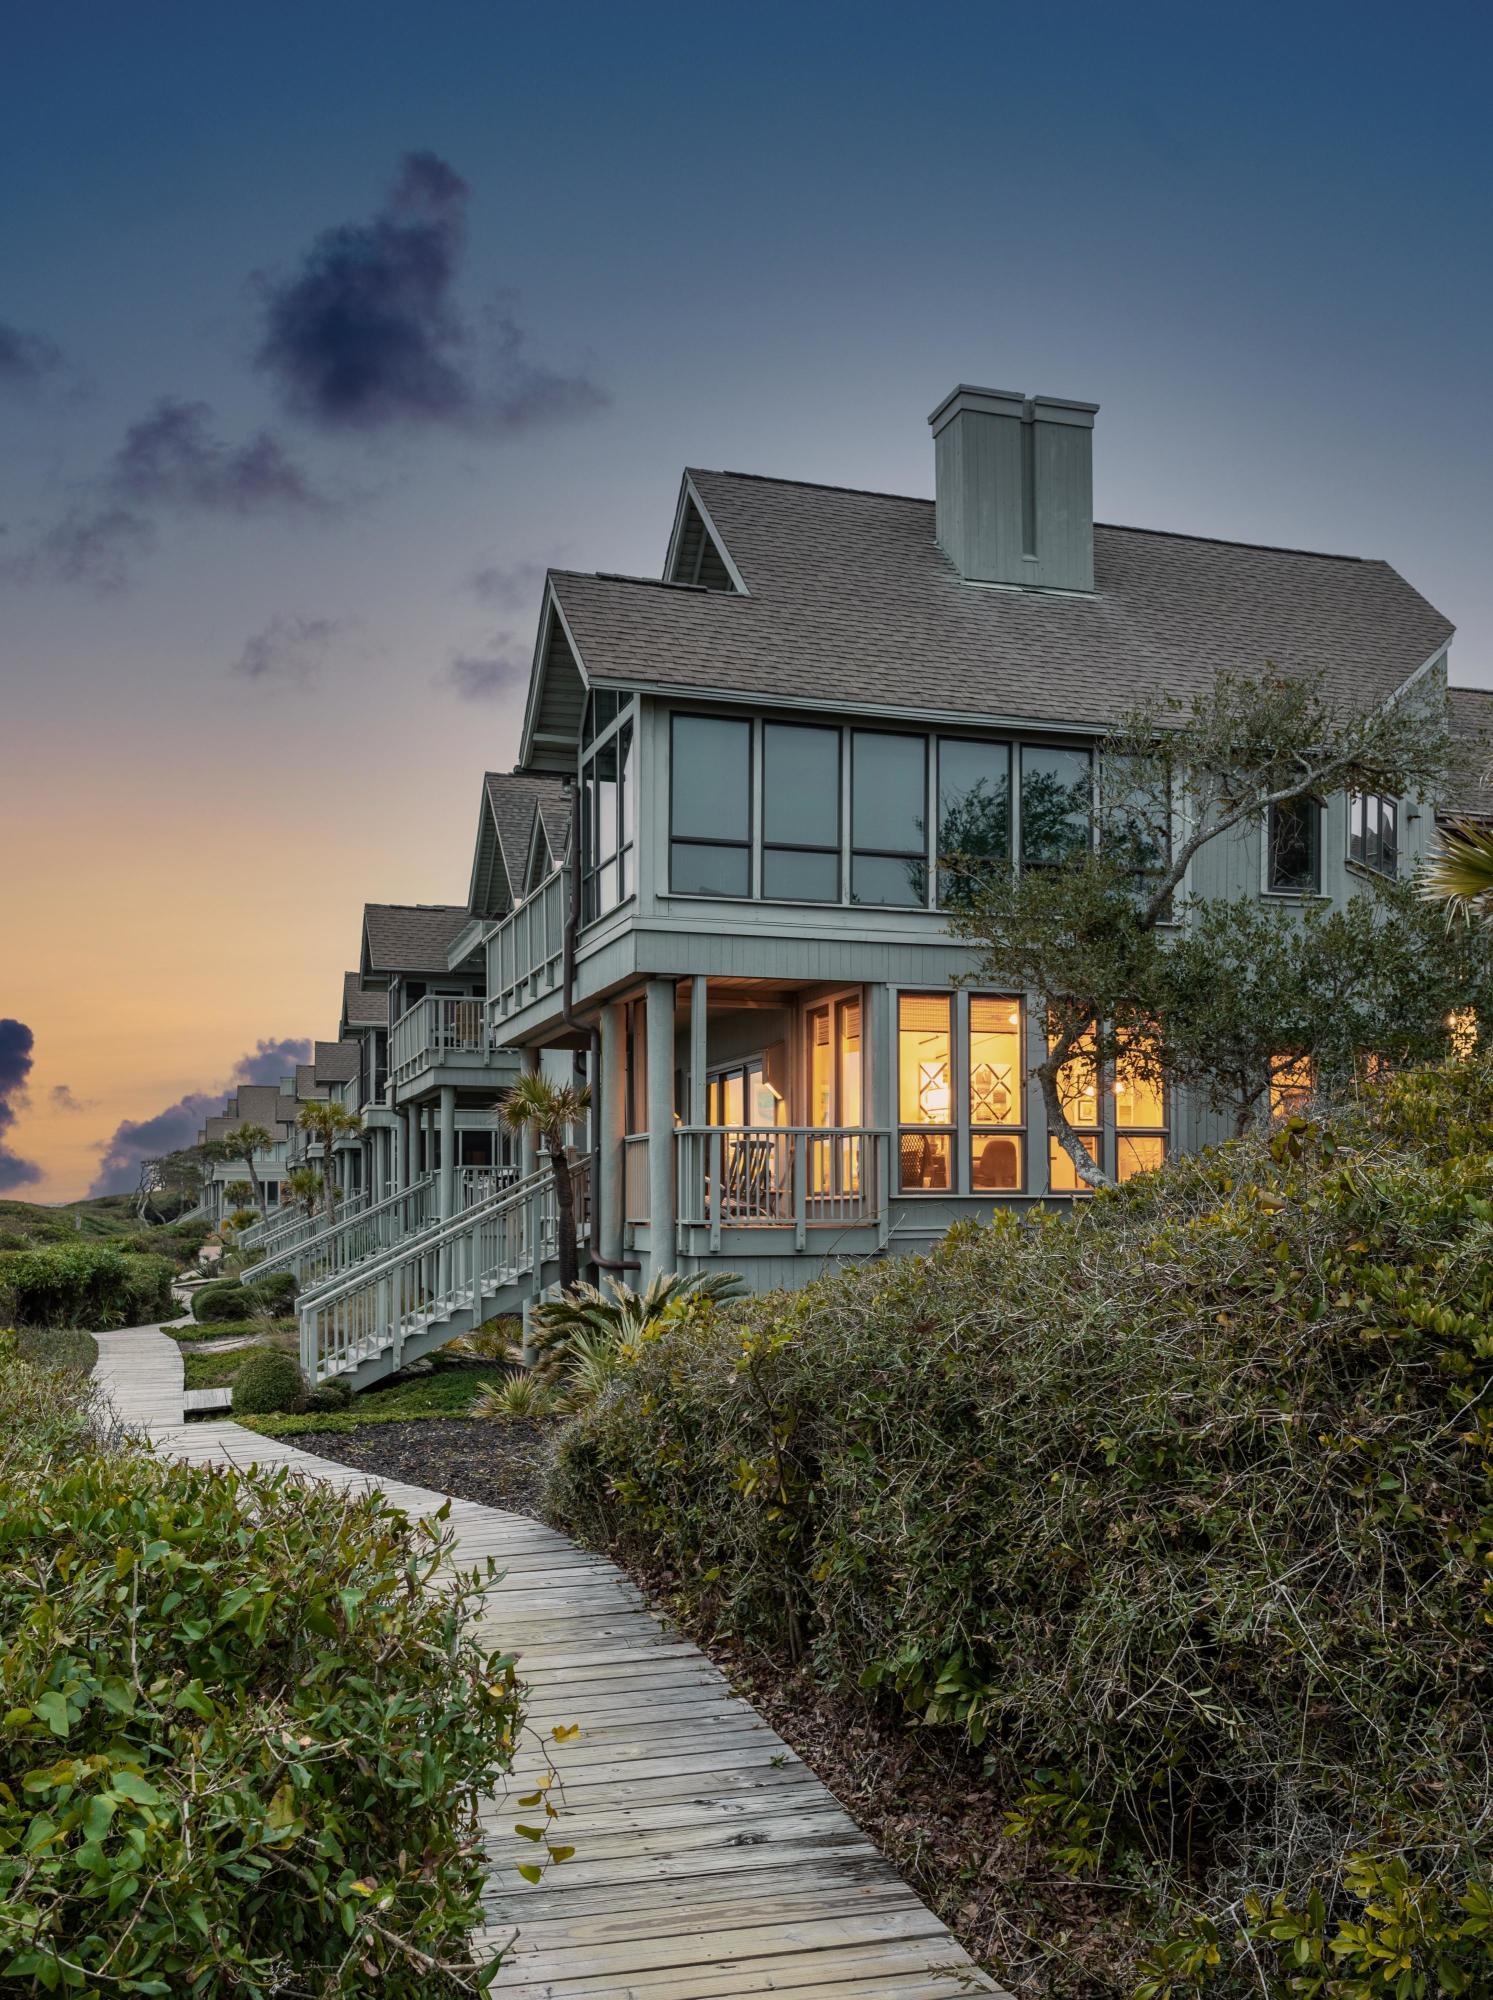 Kiawah Island Homes For Sale - 4200 Mariners Watch, Kiawah Island, SC - 43